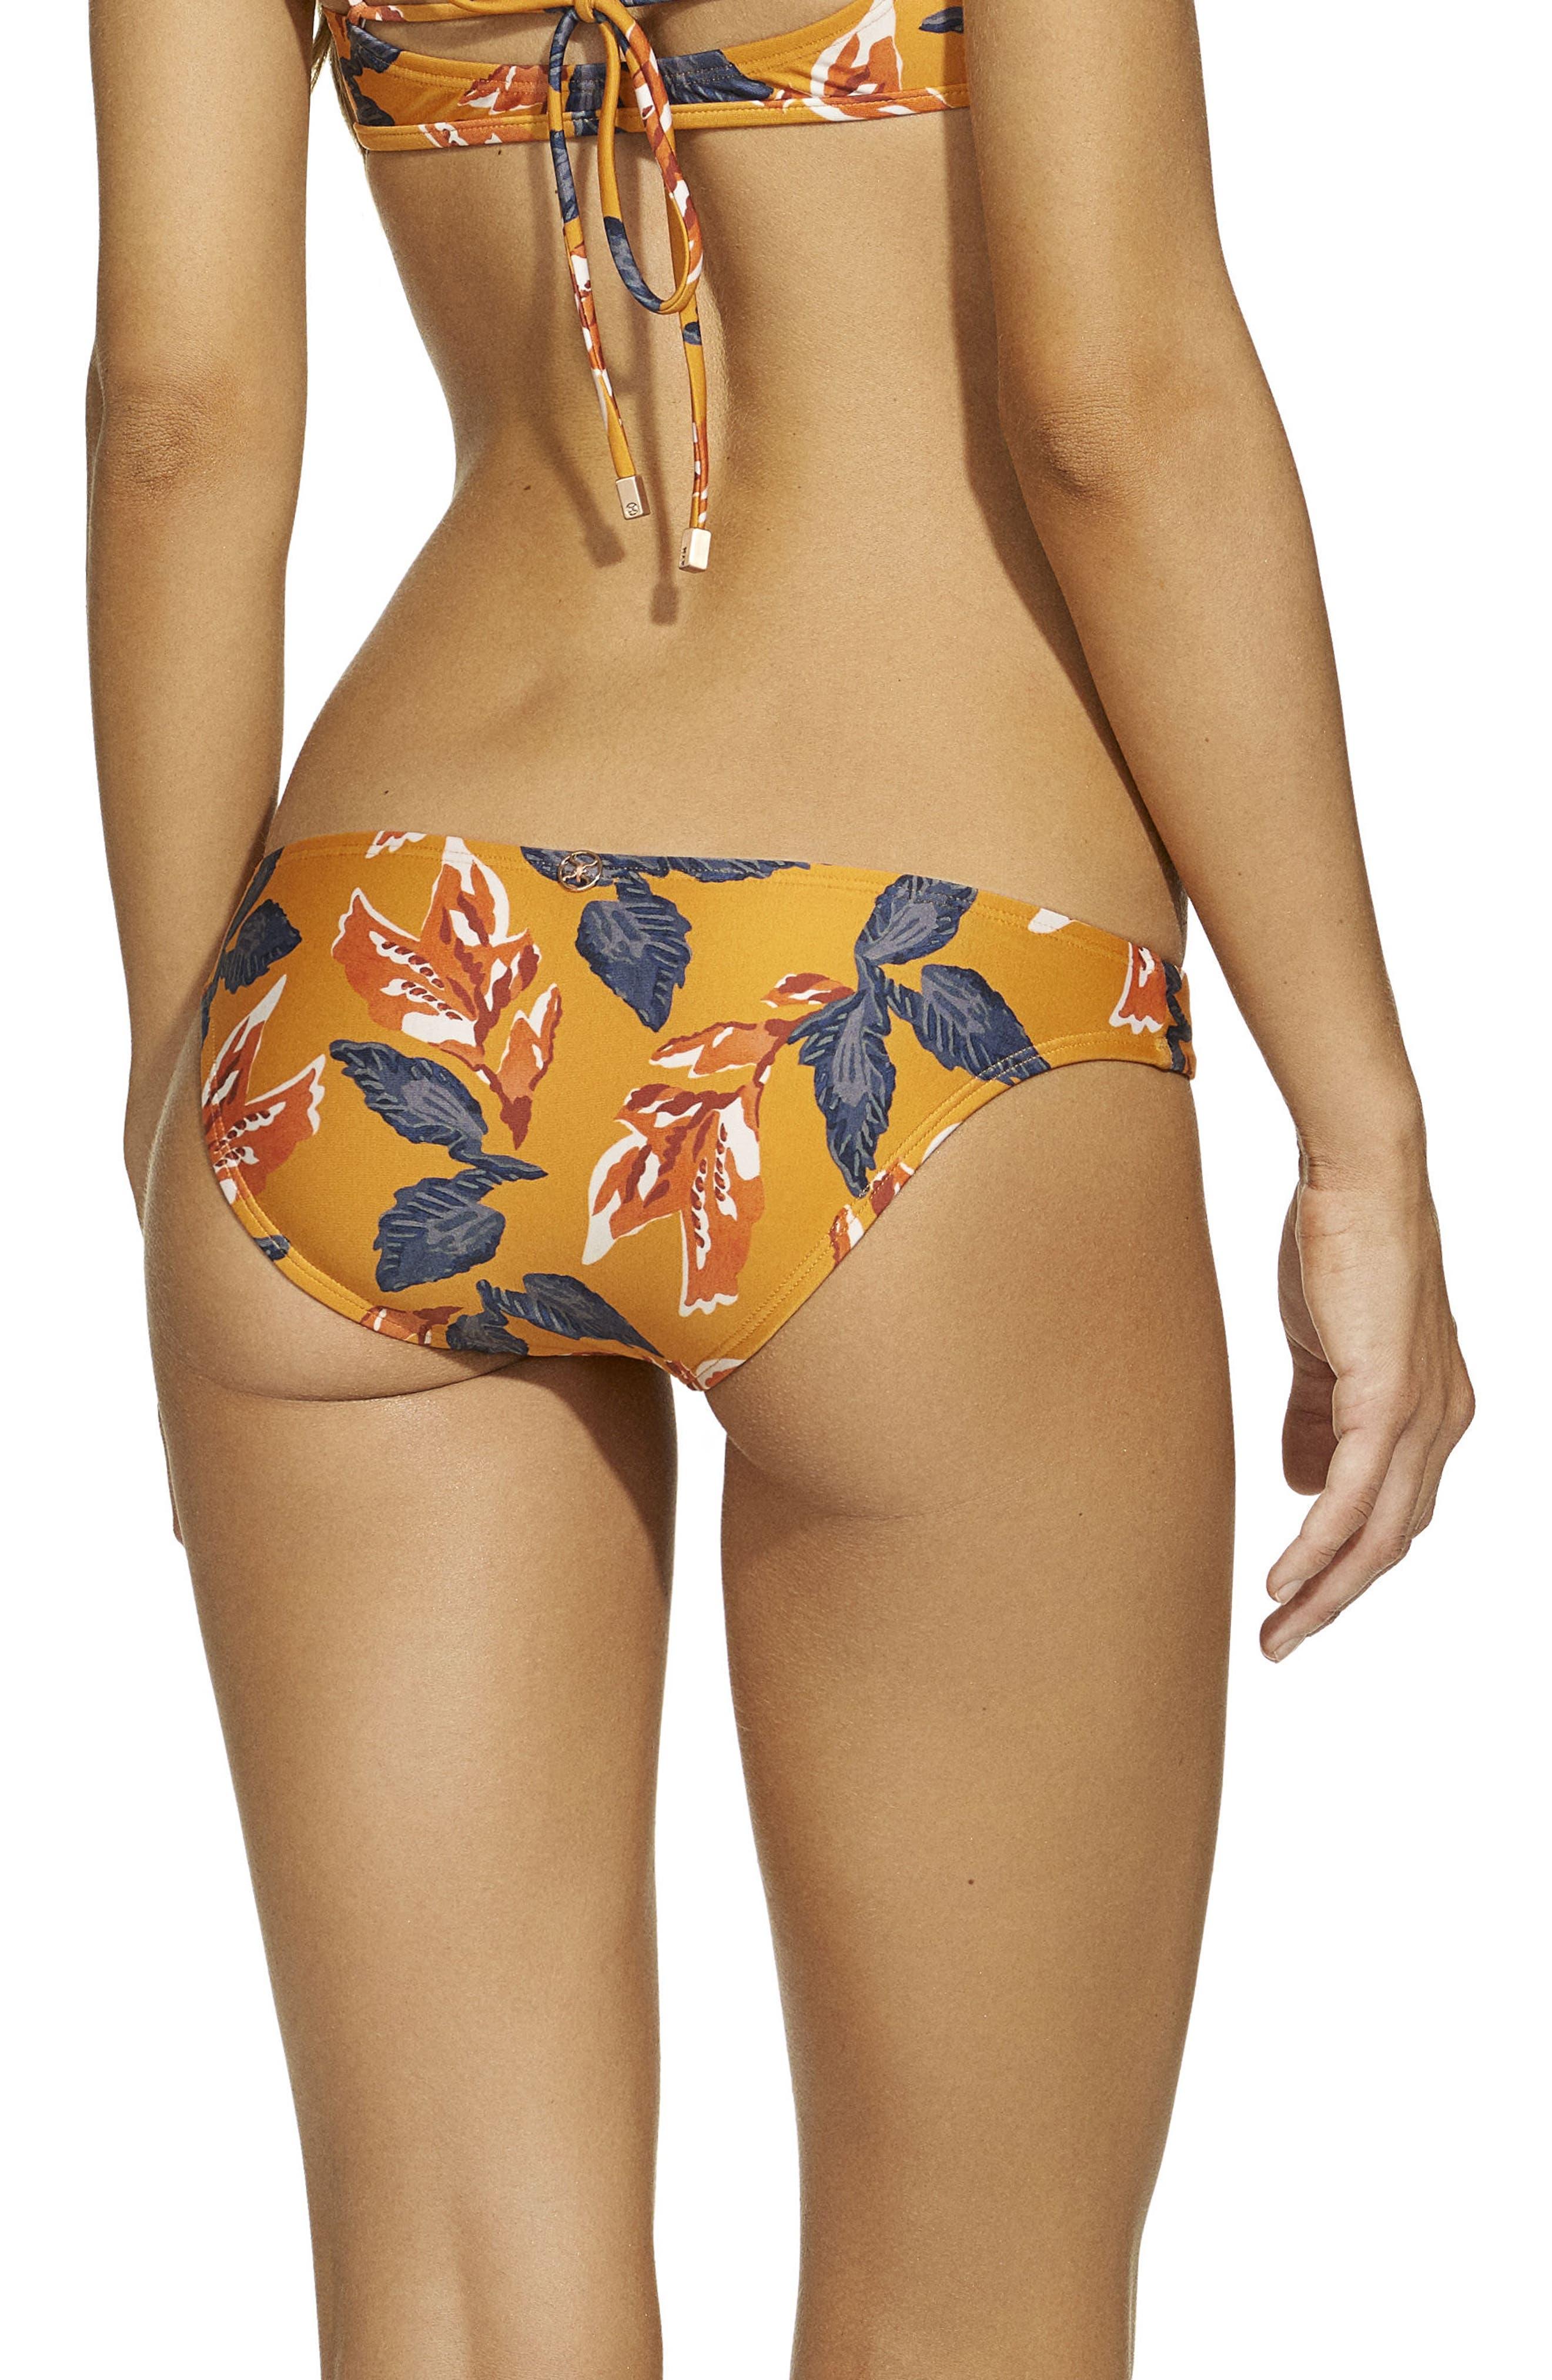 Tulum Print Bikini Bottoms,                             Alternate thumbnail 2, color,                             Orange Multi